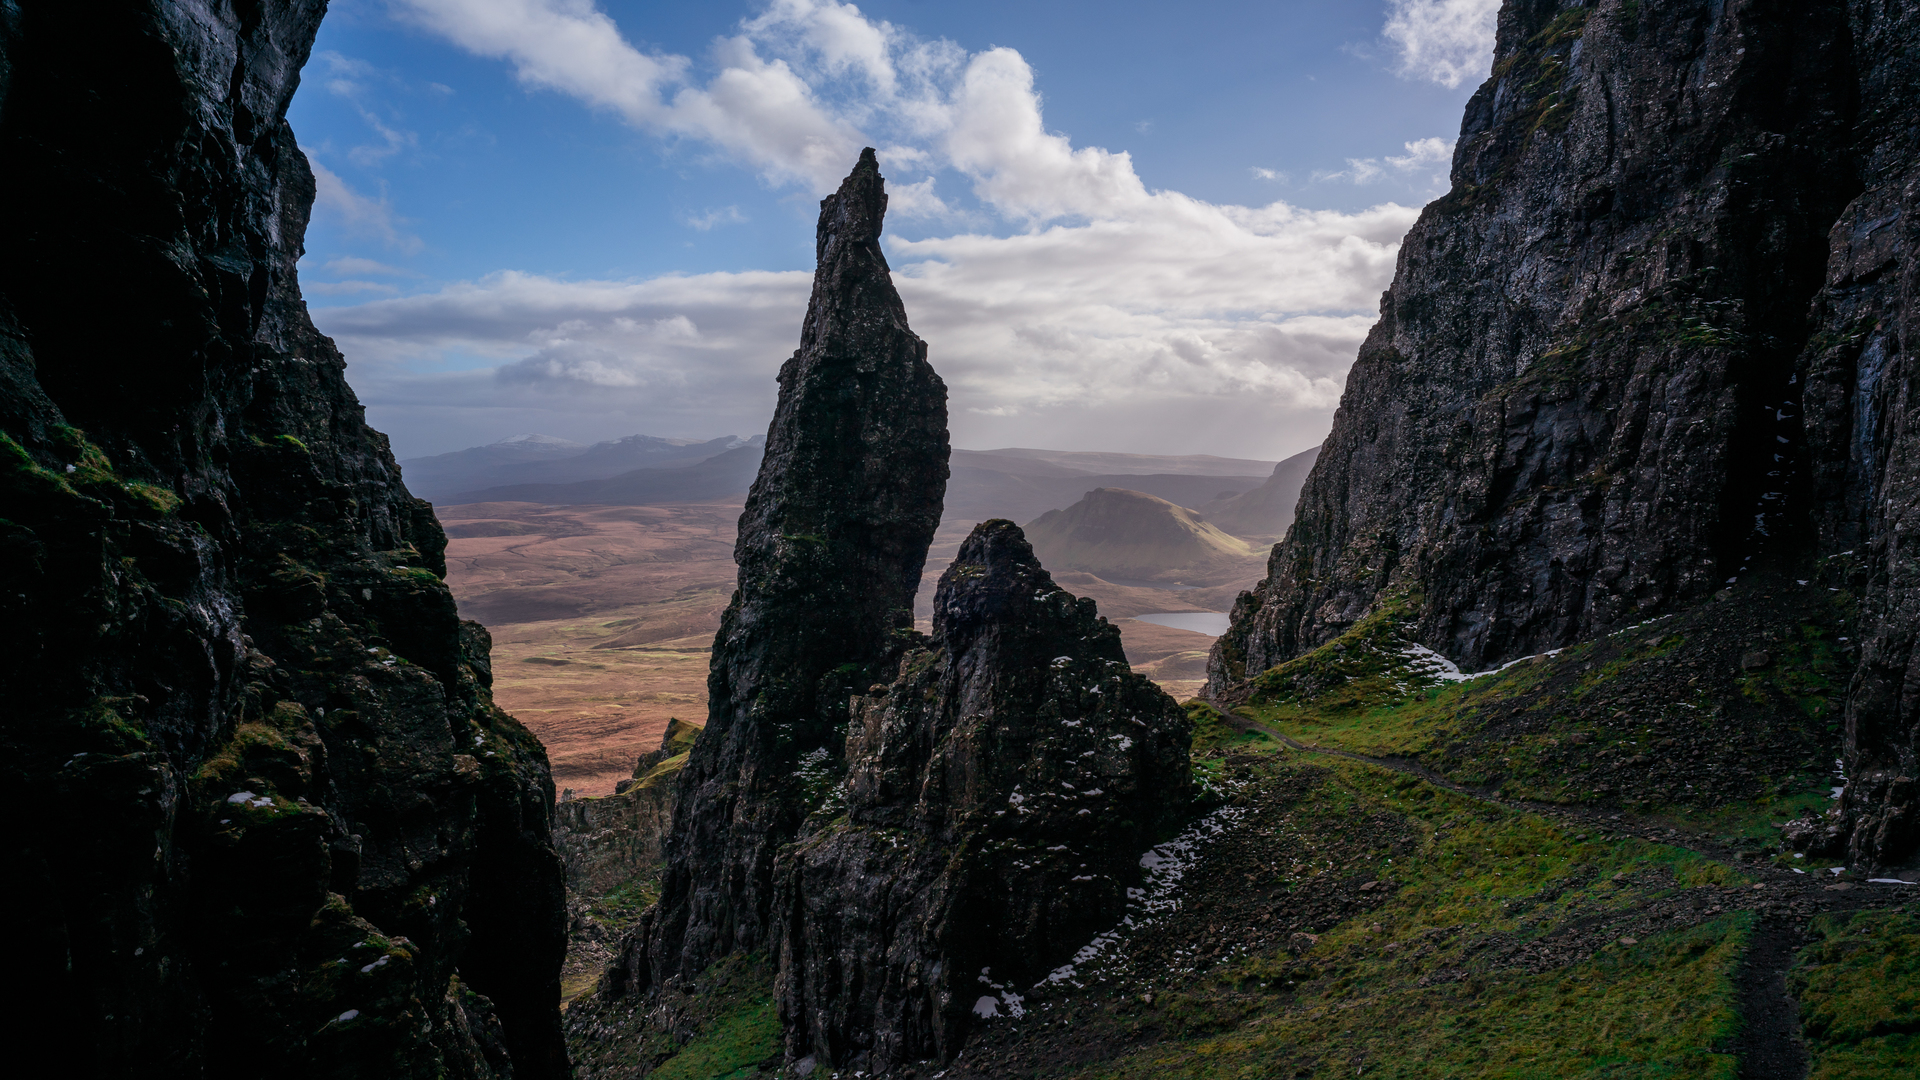 Isle Of Skye Scotland Rock 1920x1080